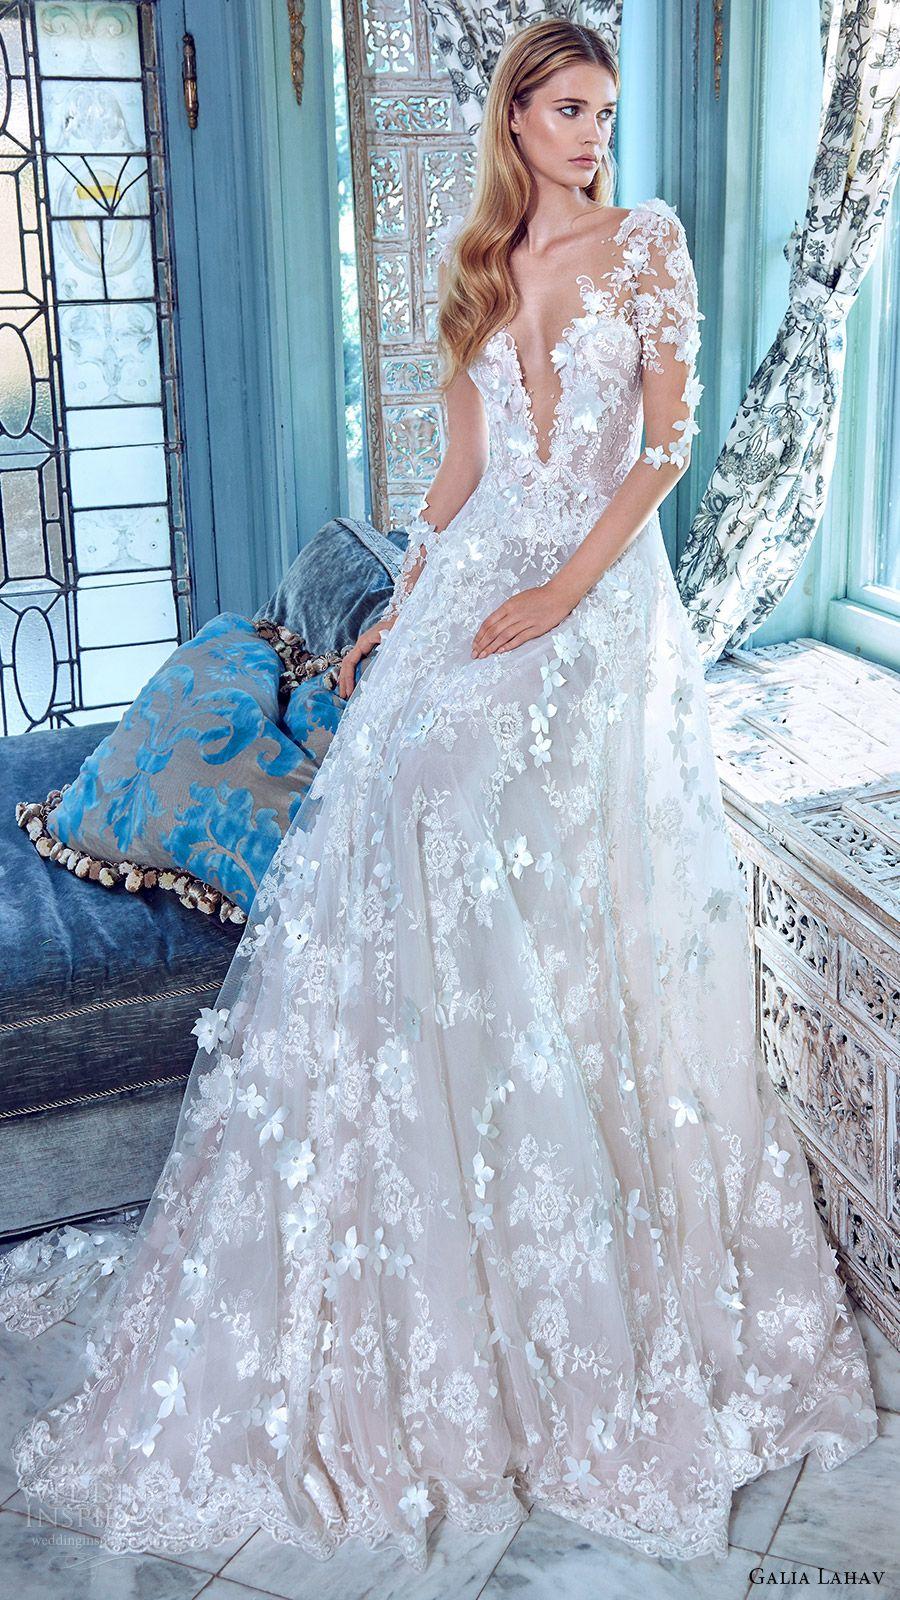 galia lahav bridal spring 2017 illusion long sleees deep vneck aline lace wedding dress (arabella) mv